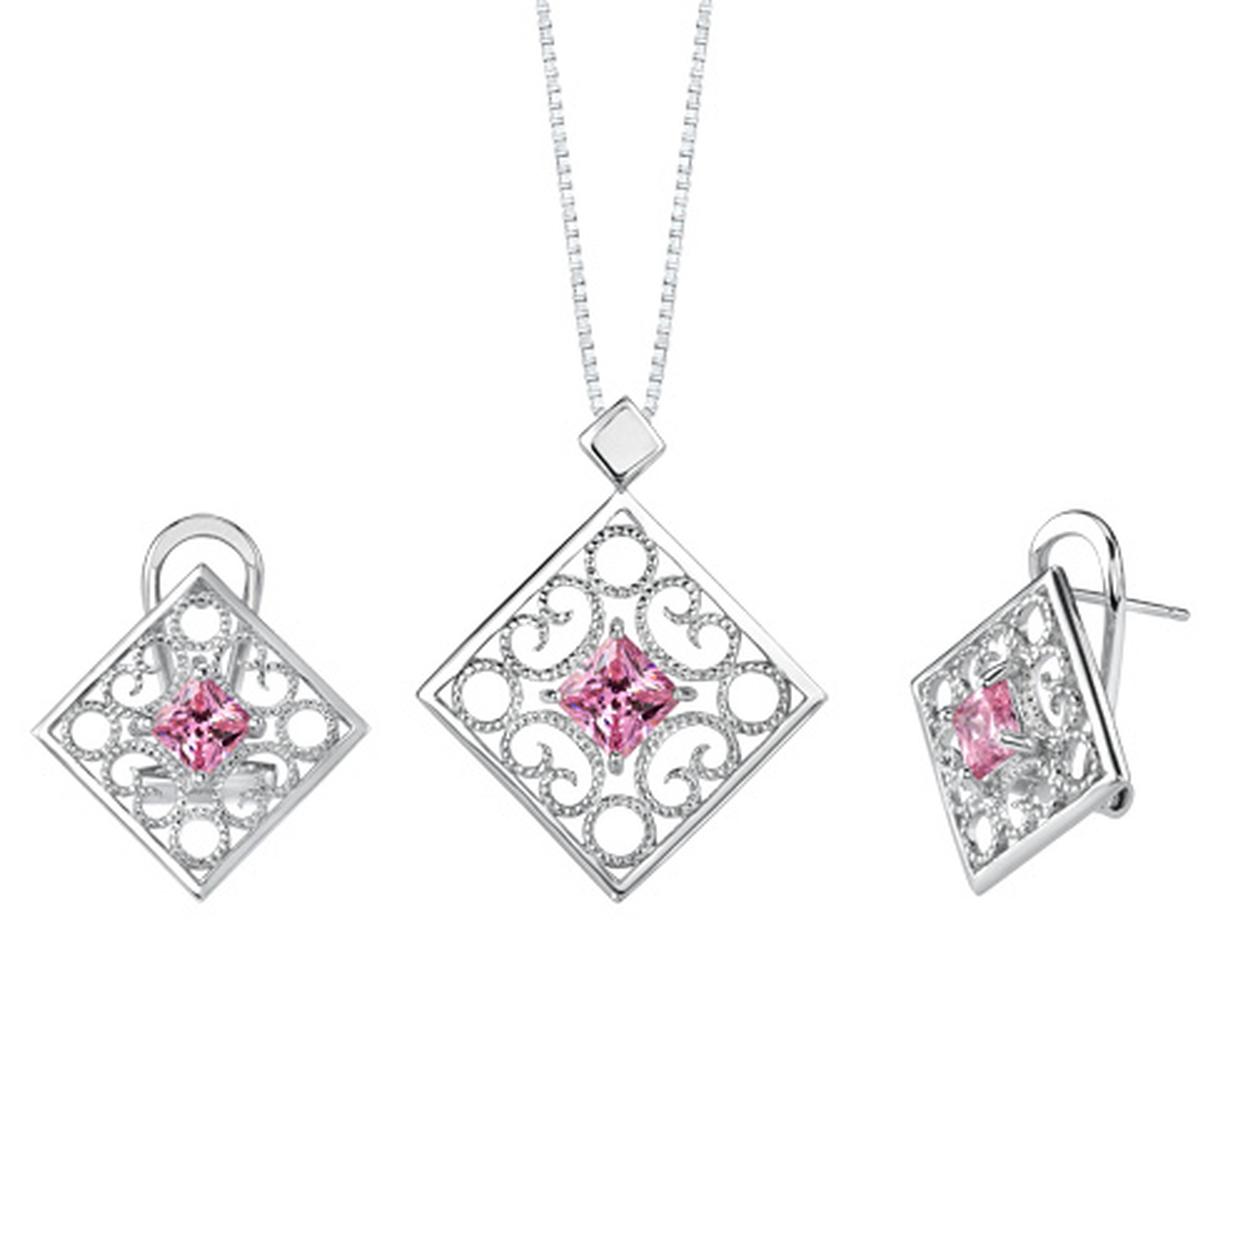 Princess Cut Pink Cubic Zirconia Pendant Earrings Set In Sterling Silver Style Ss2098